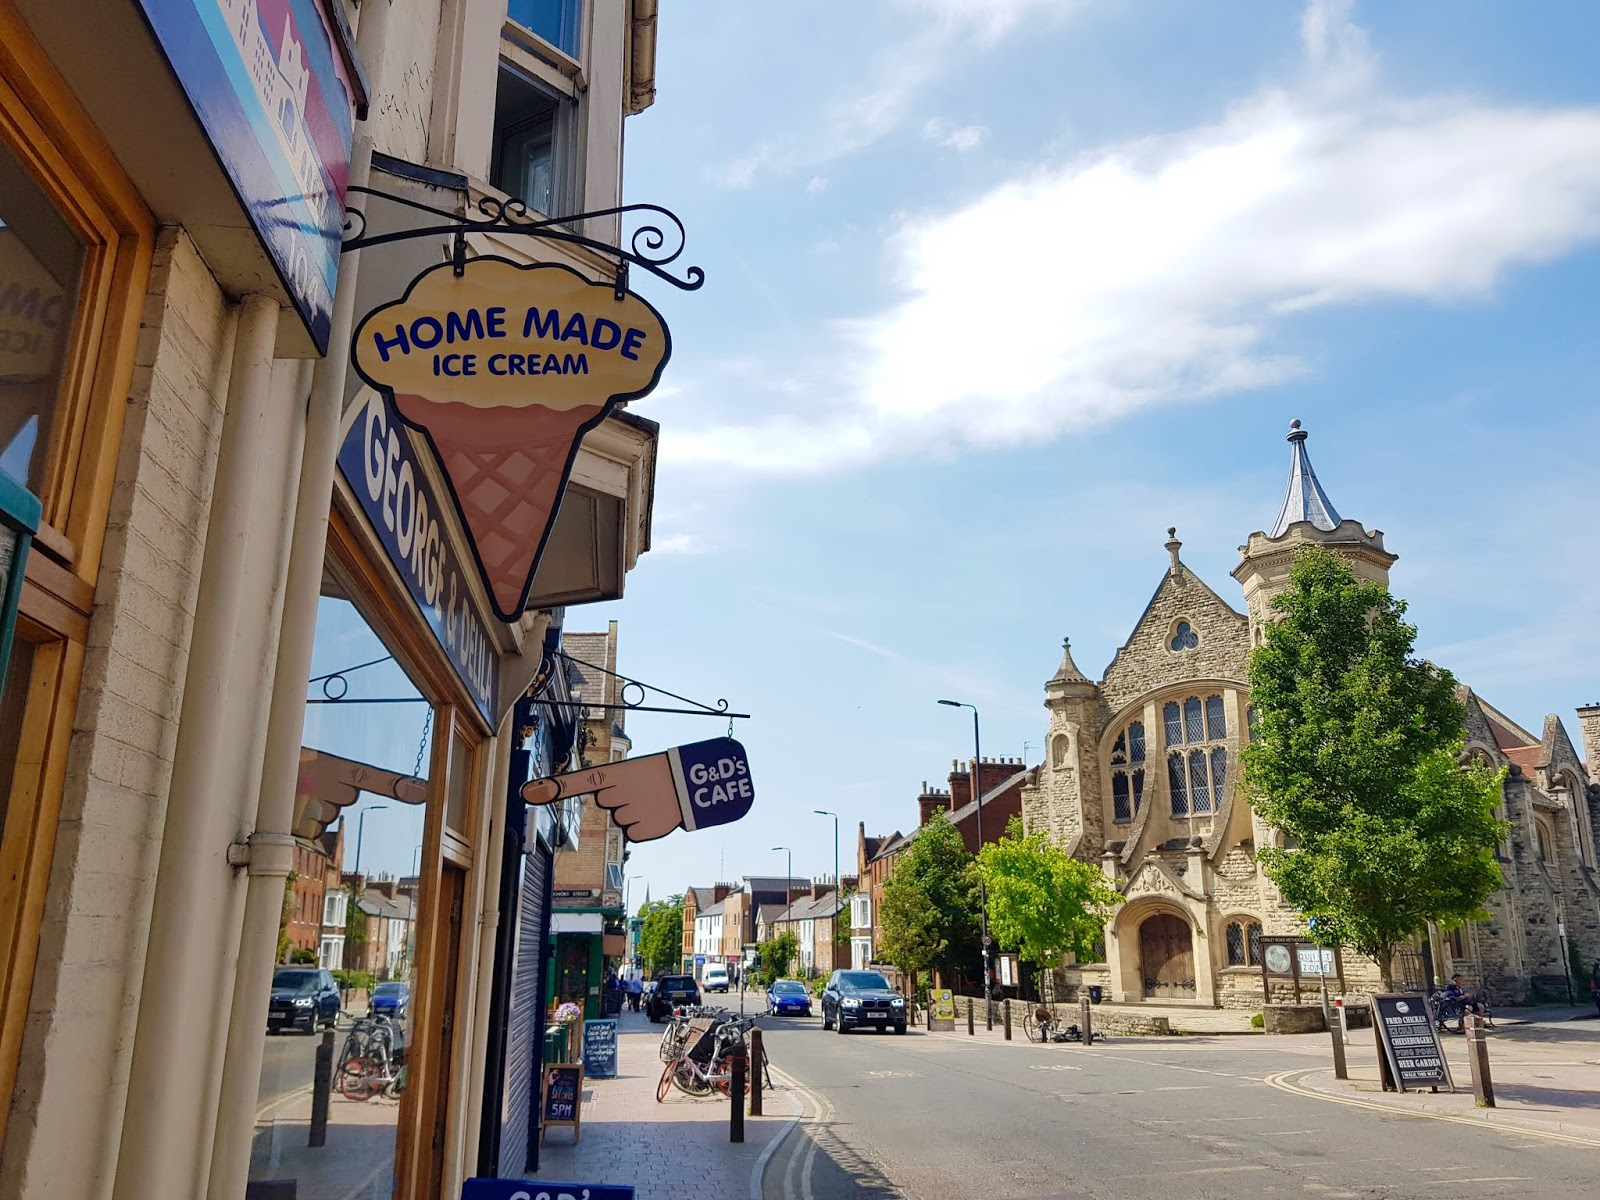 oxford travel local visit tourist cowley road G&D ice cream